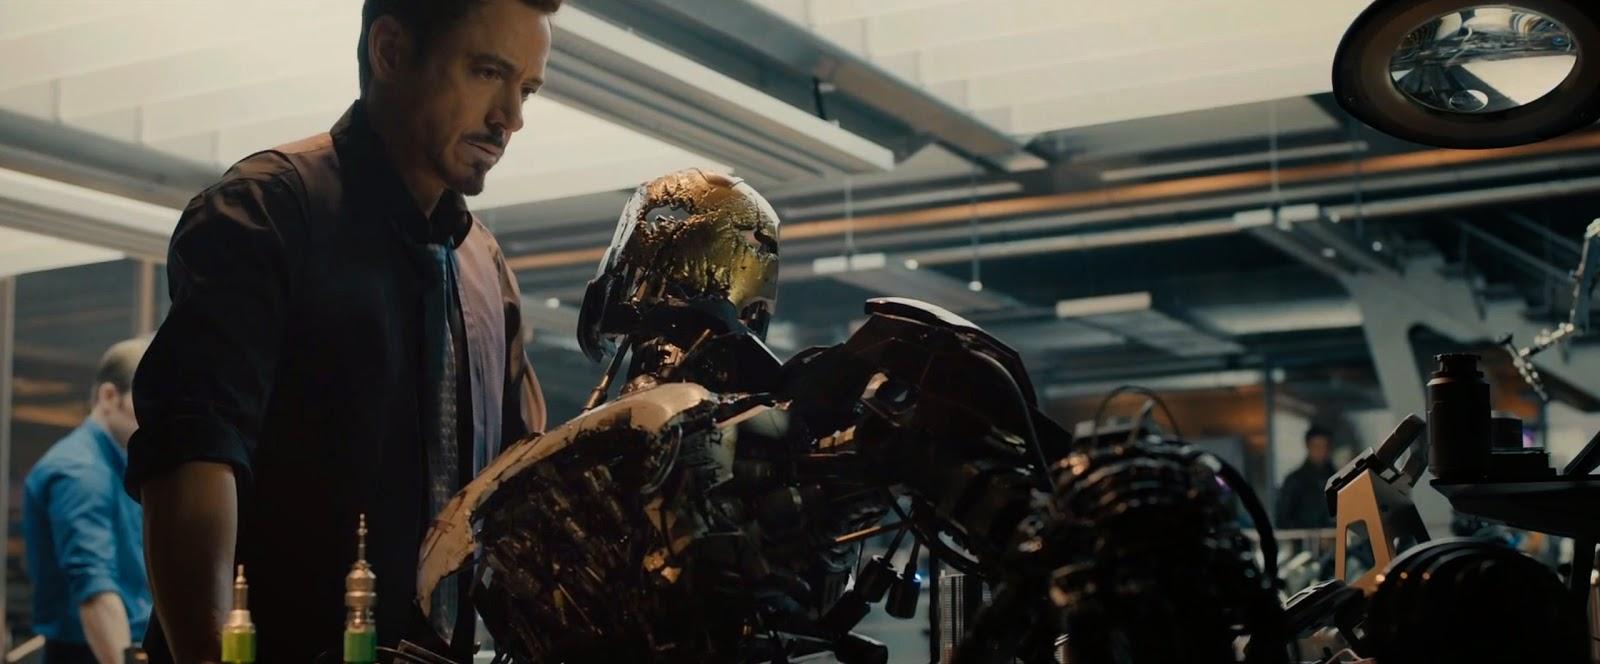 Age of Ultron, Avengers, Robert Downey Jr., Chris Hemsworth, Chris Evans, Scarlett Johansson Jeremy Renner, Ultron, Vision, Scarlet Witch, Marvels, Quicksilver